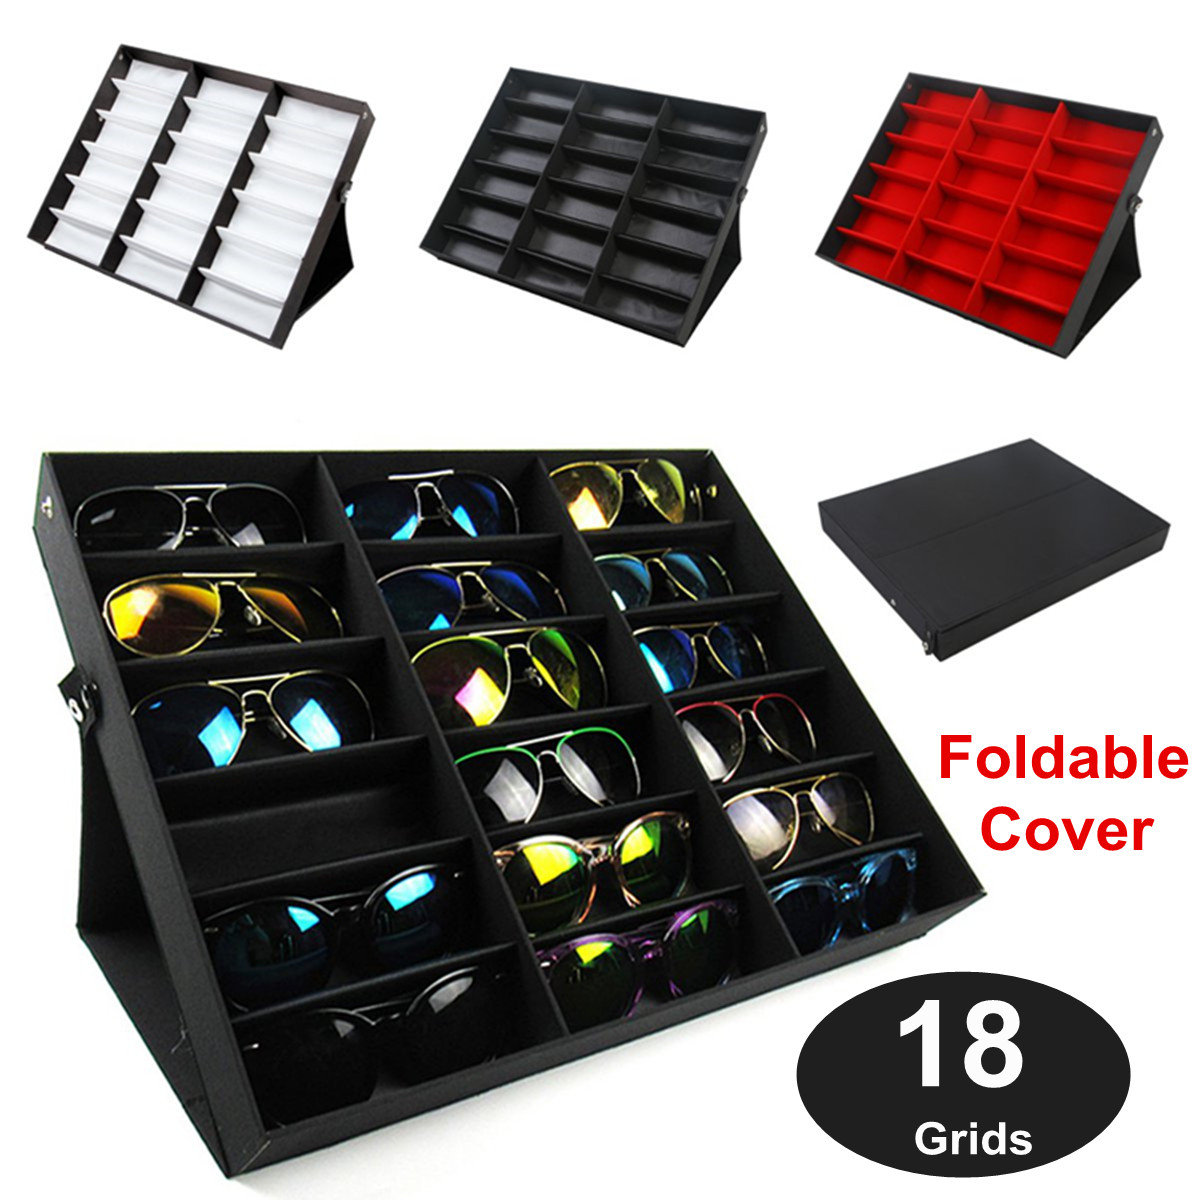 Organizer Case Sunglasses Storage-Box Display-Stand Foldable Holder Modern 18-Grids Wardrobe